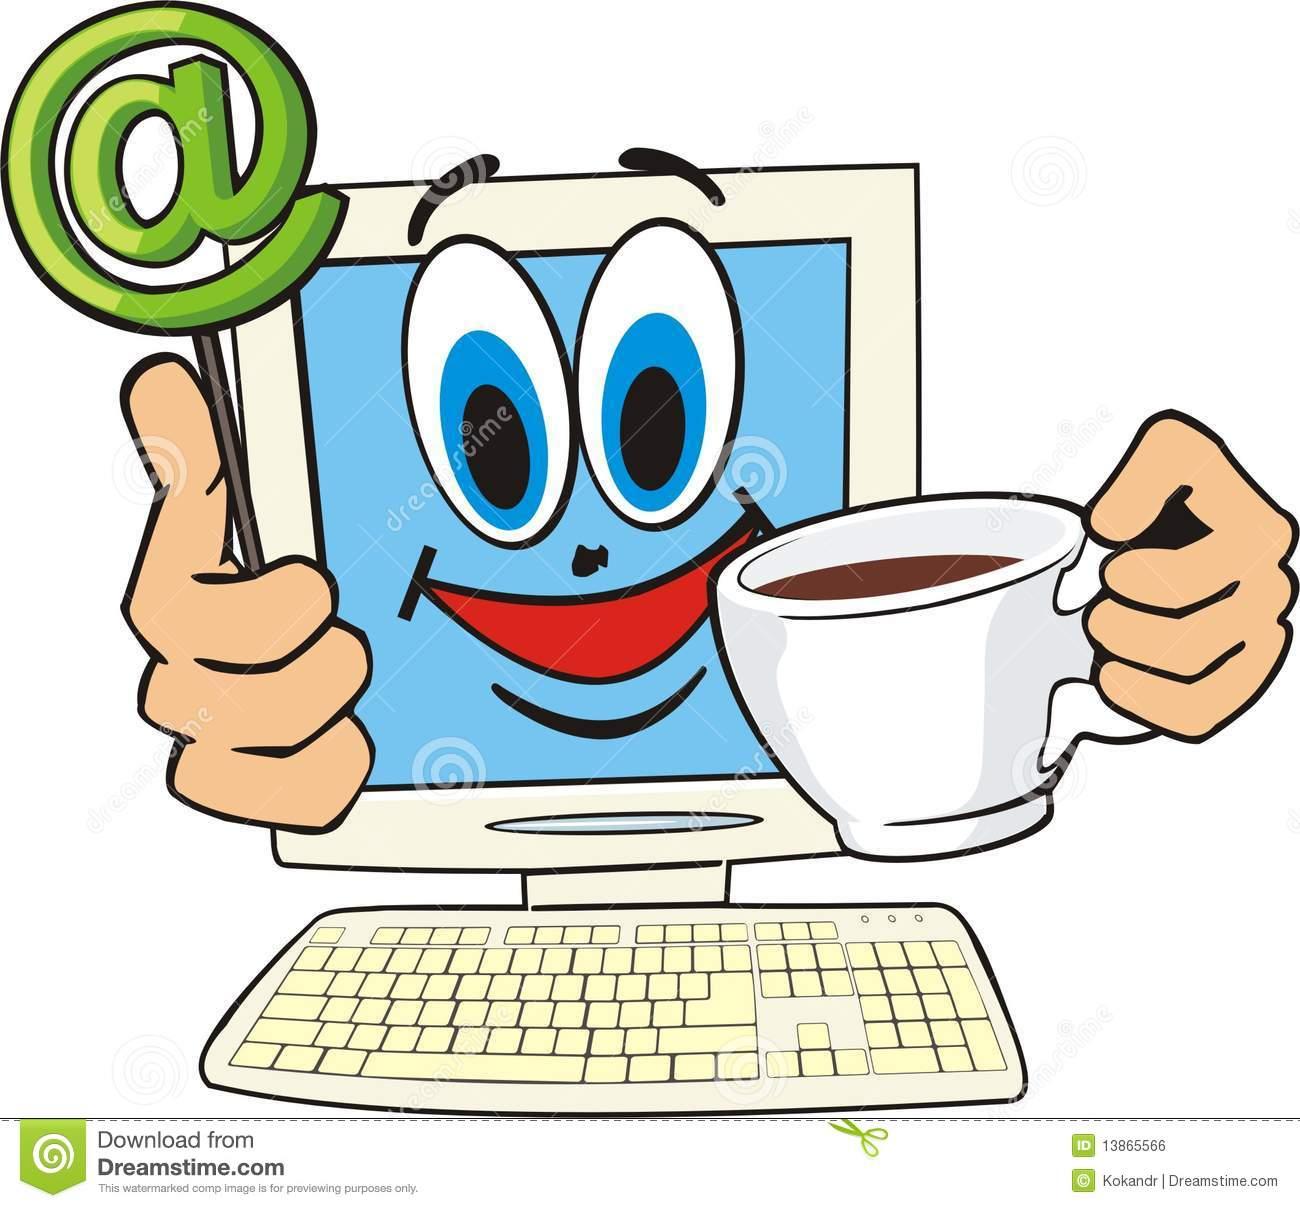 Internet cafe stock vector. Illustration of computer.